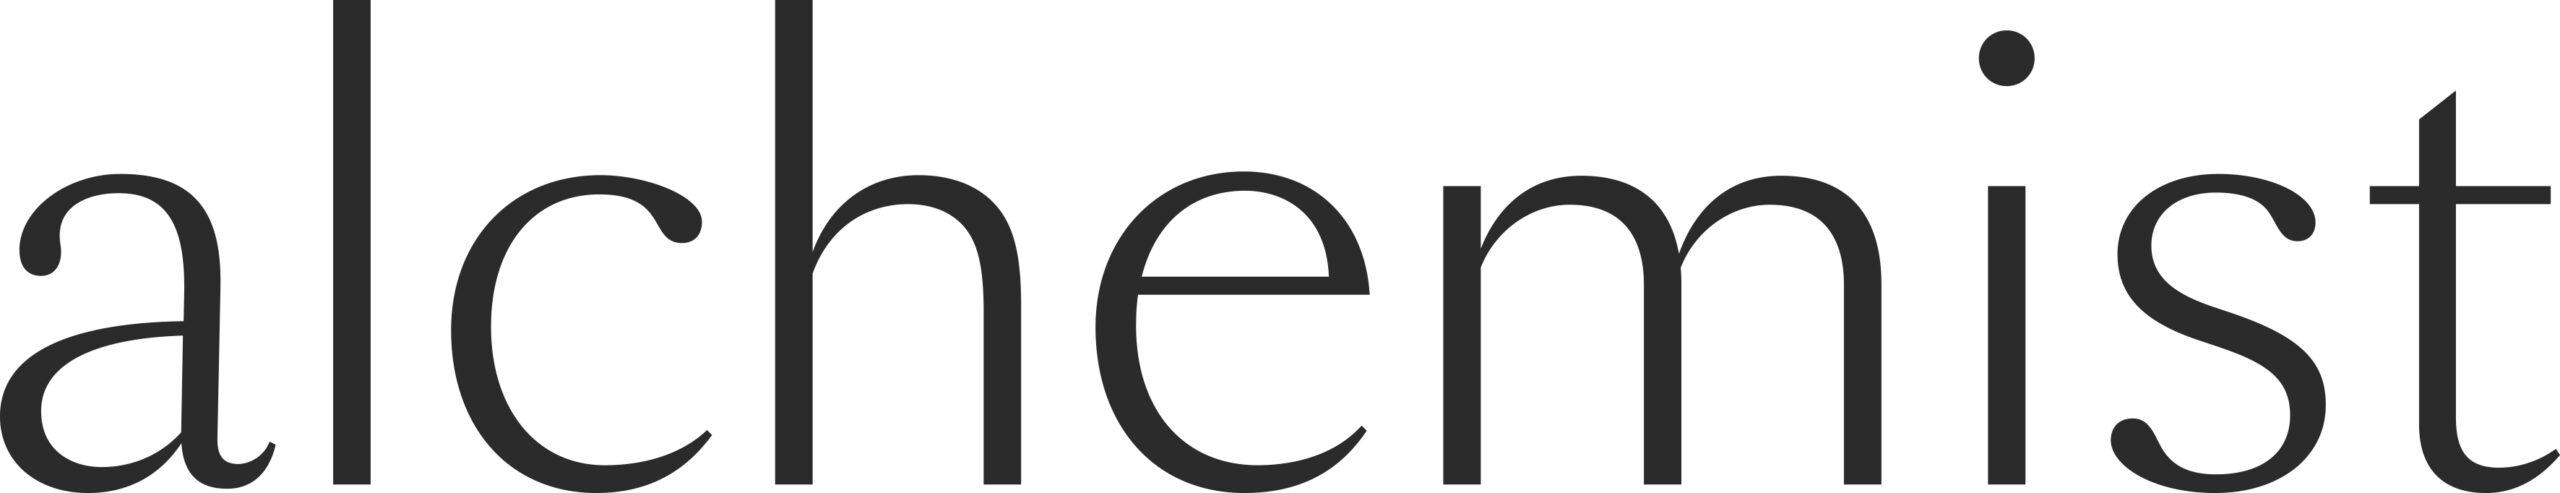 logo_alchemist